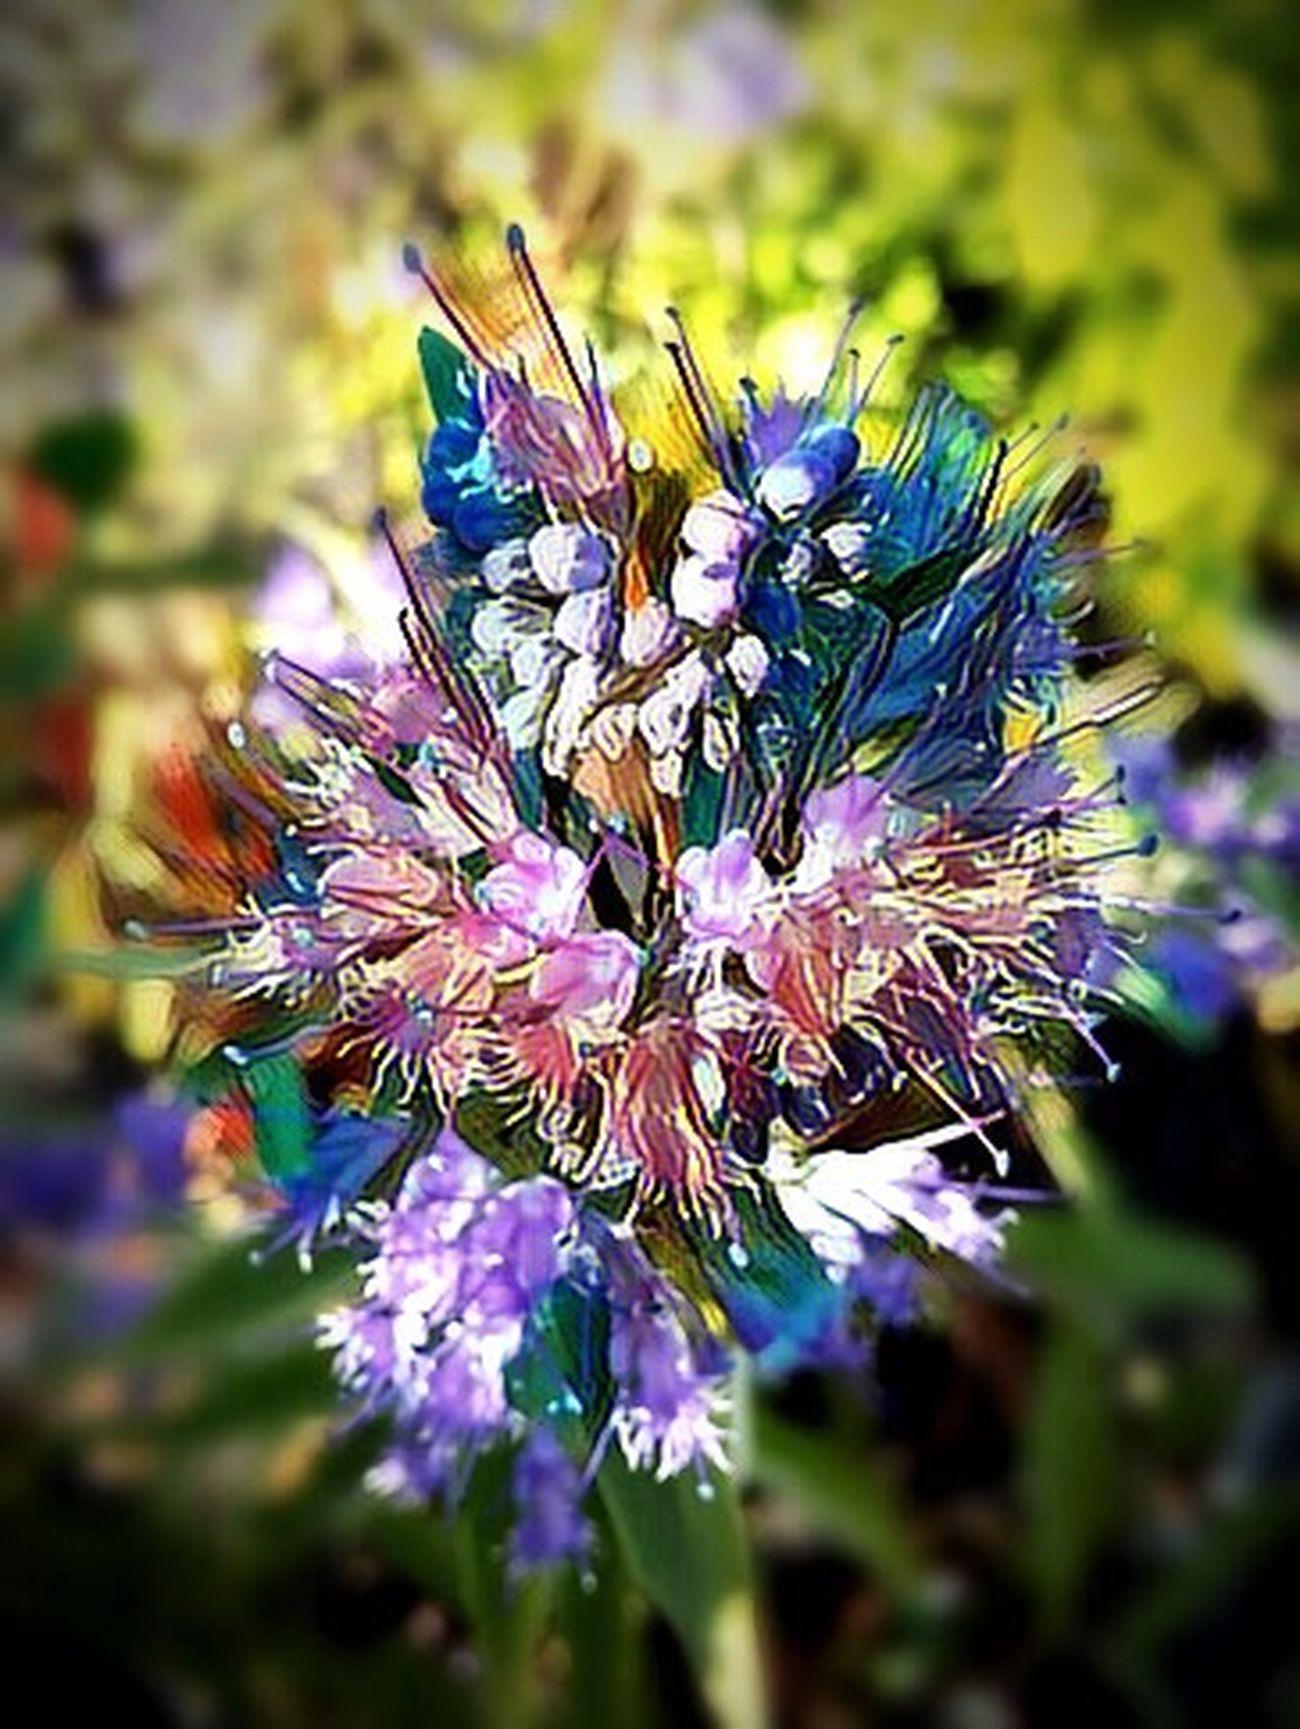 Photography Flower Focus On Foreground Fragility My Edit Picsart Edit Eyeem Edit